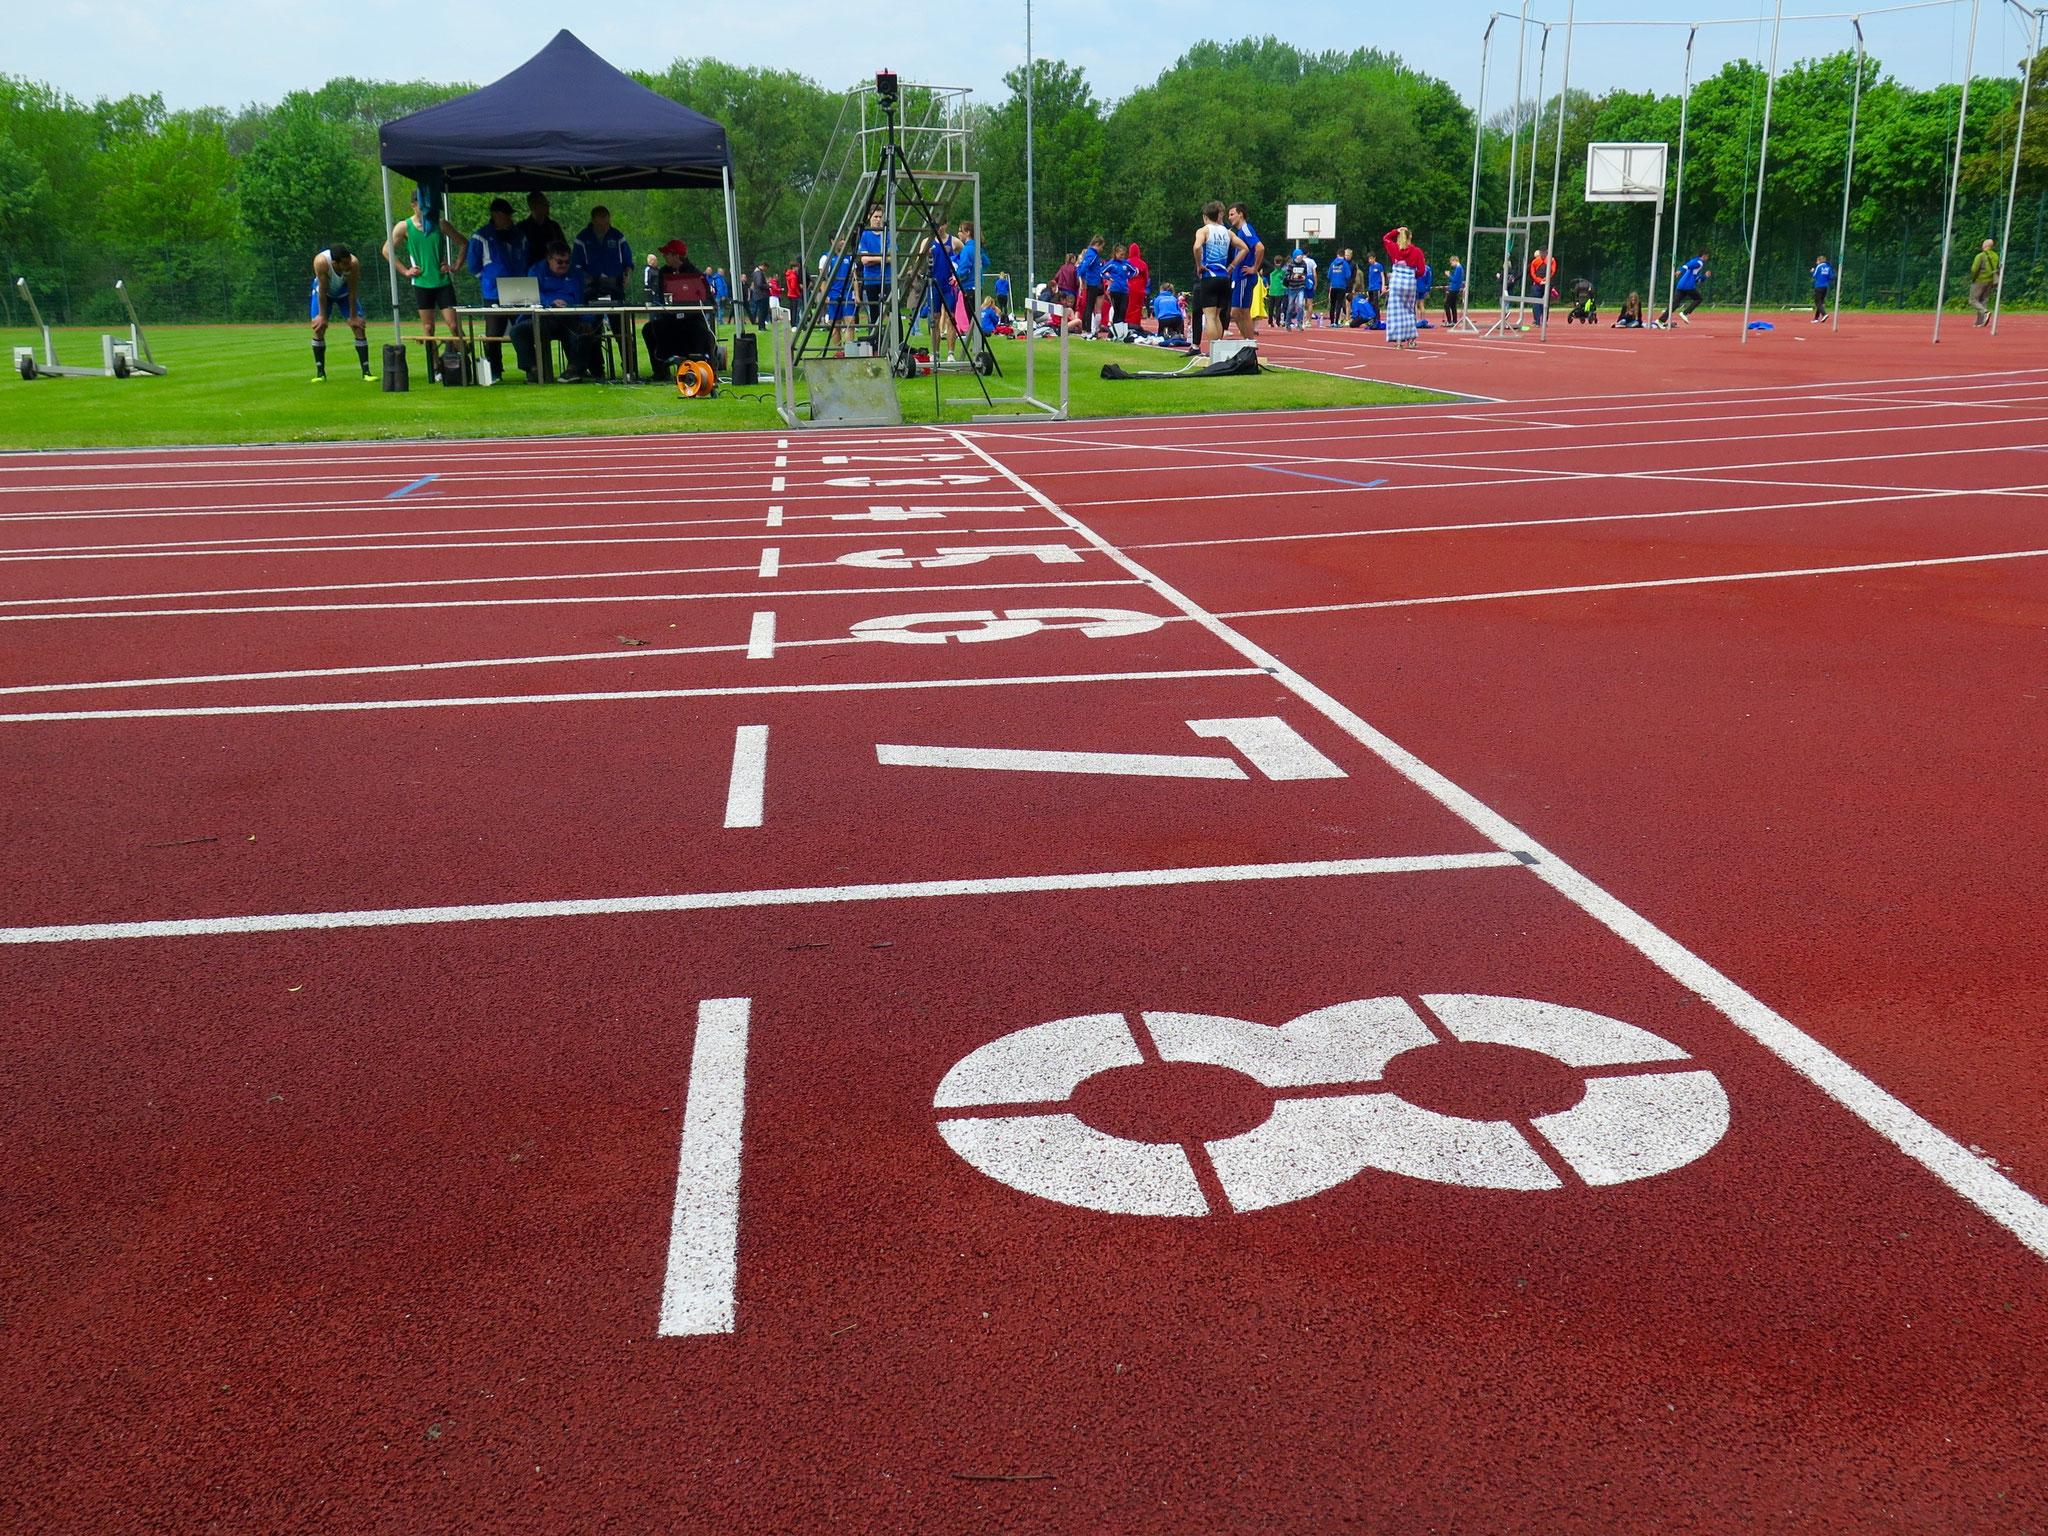 Tipp 2: Leichtathletik-Wettkämpfe | Sa, 7. September, ab 10 Uhr | Stadion Wuhletal, Teterower Ring 71